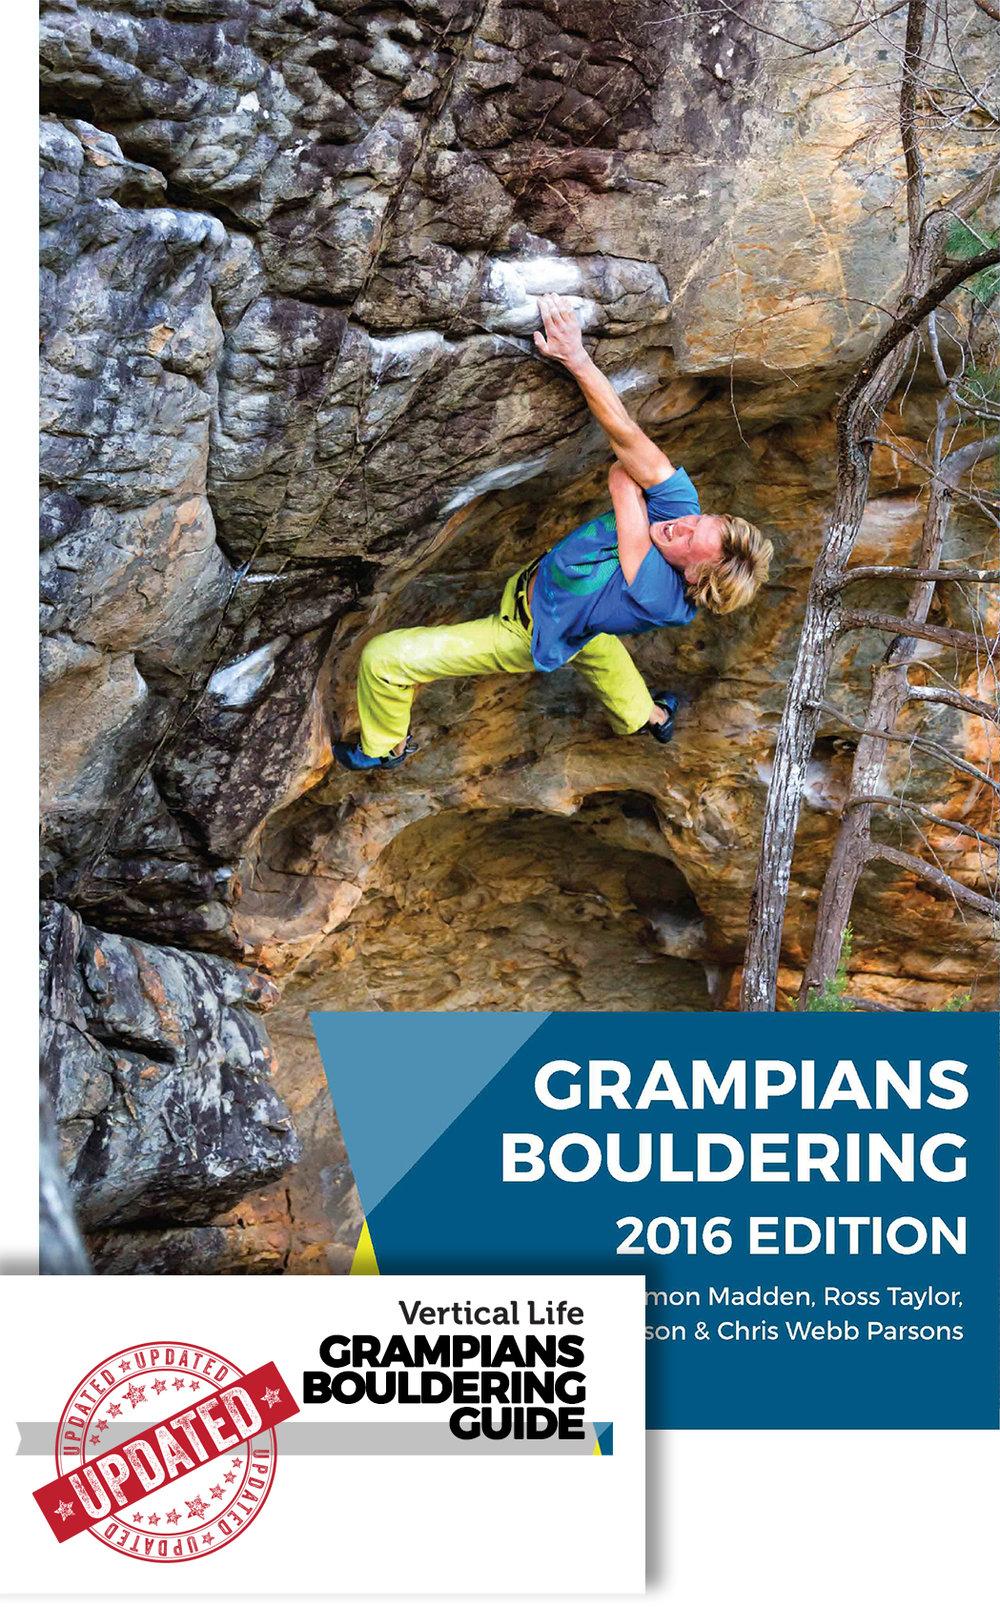 Grampians Bouldering Guide_cover BANNER_LOGO.jpg